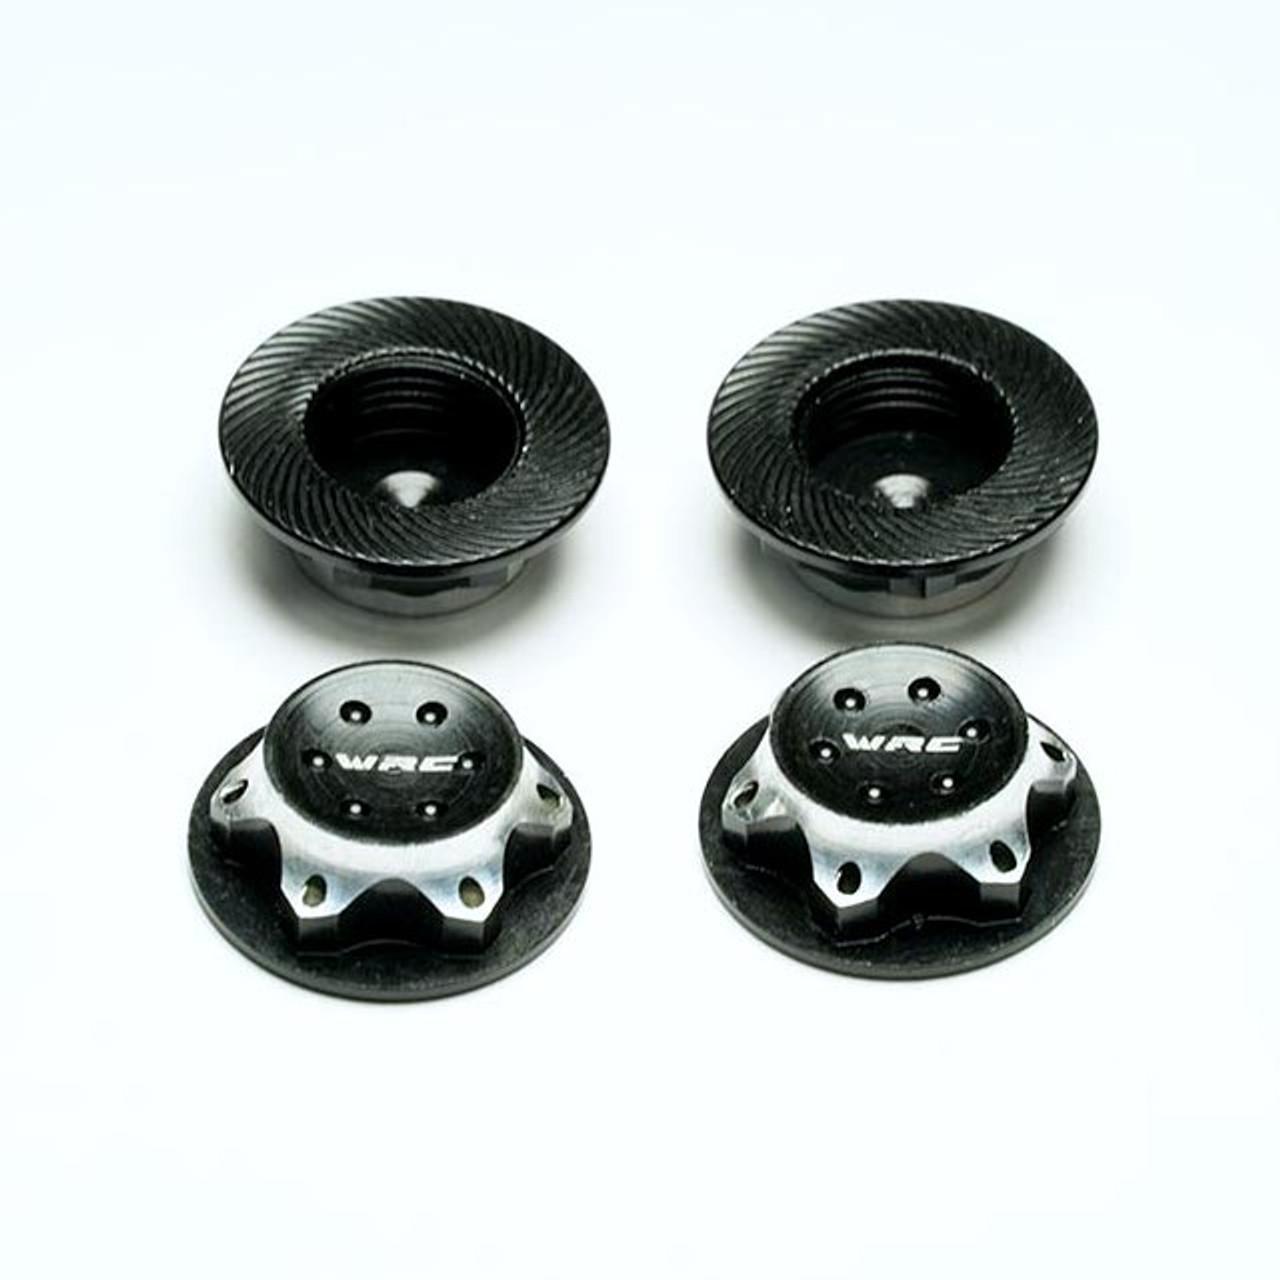 Option - Wheel Nuts - Locking Aluminium Closed